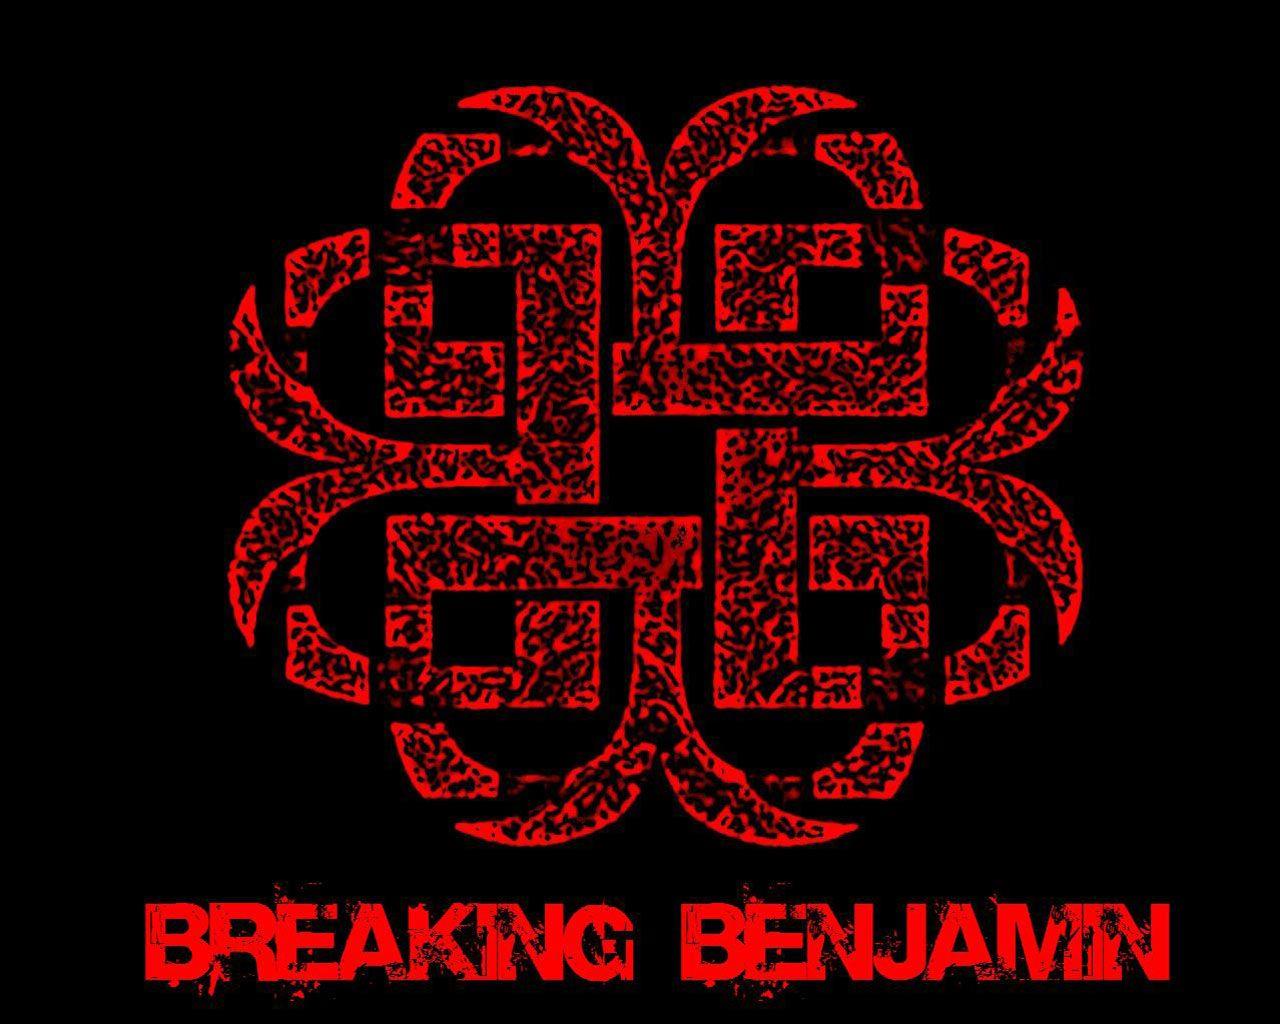 Pin By Vicky Hendrickson On Breaking Benjamin Breaking Benja